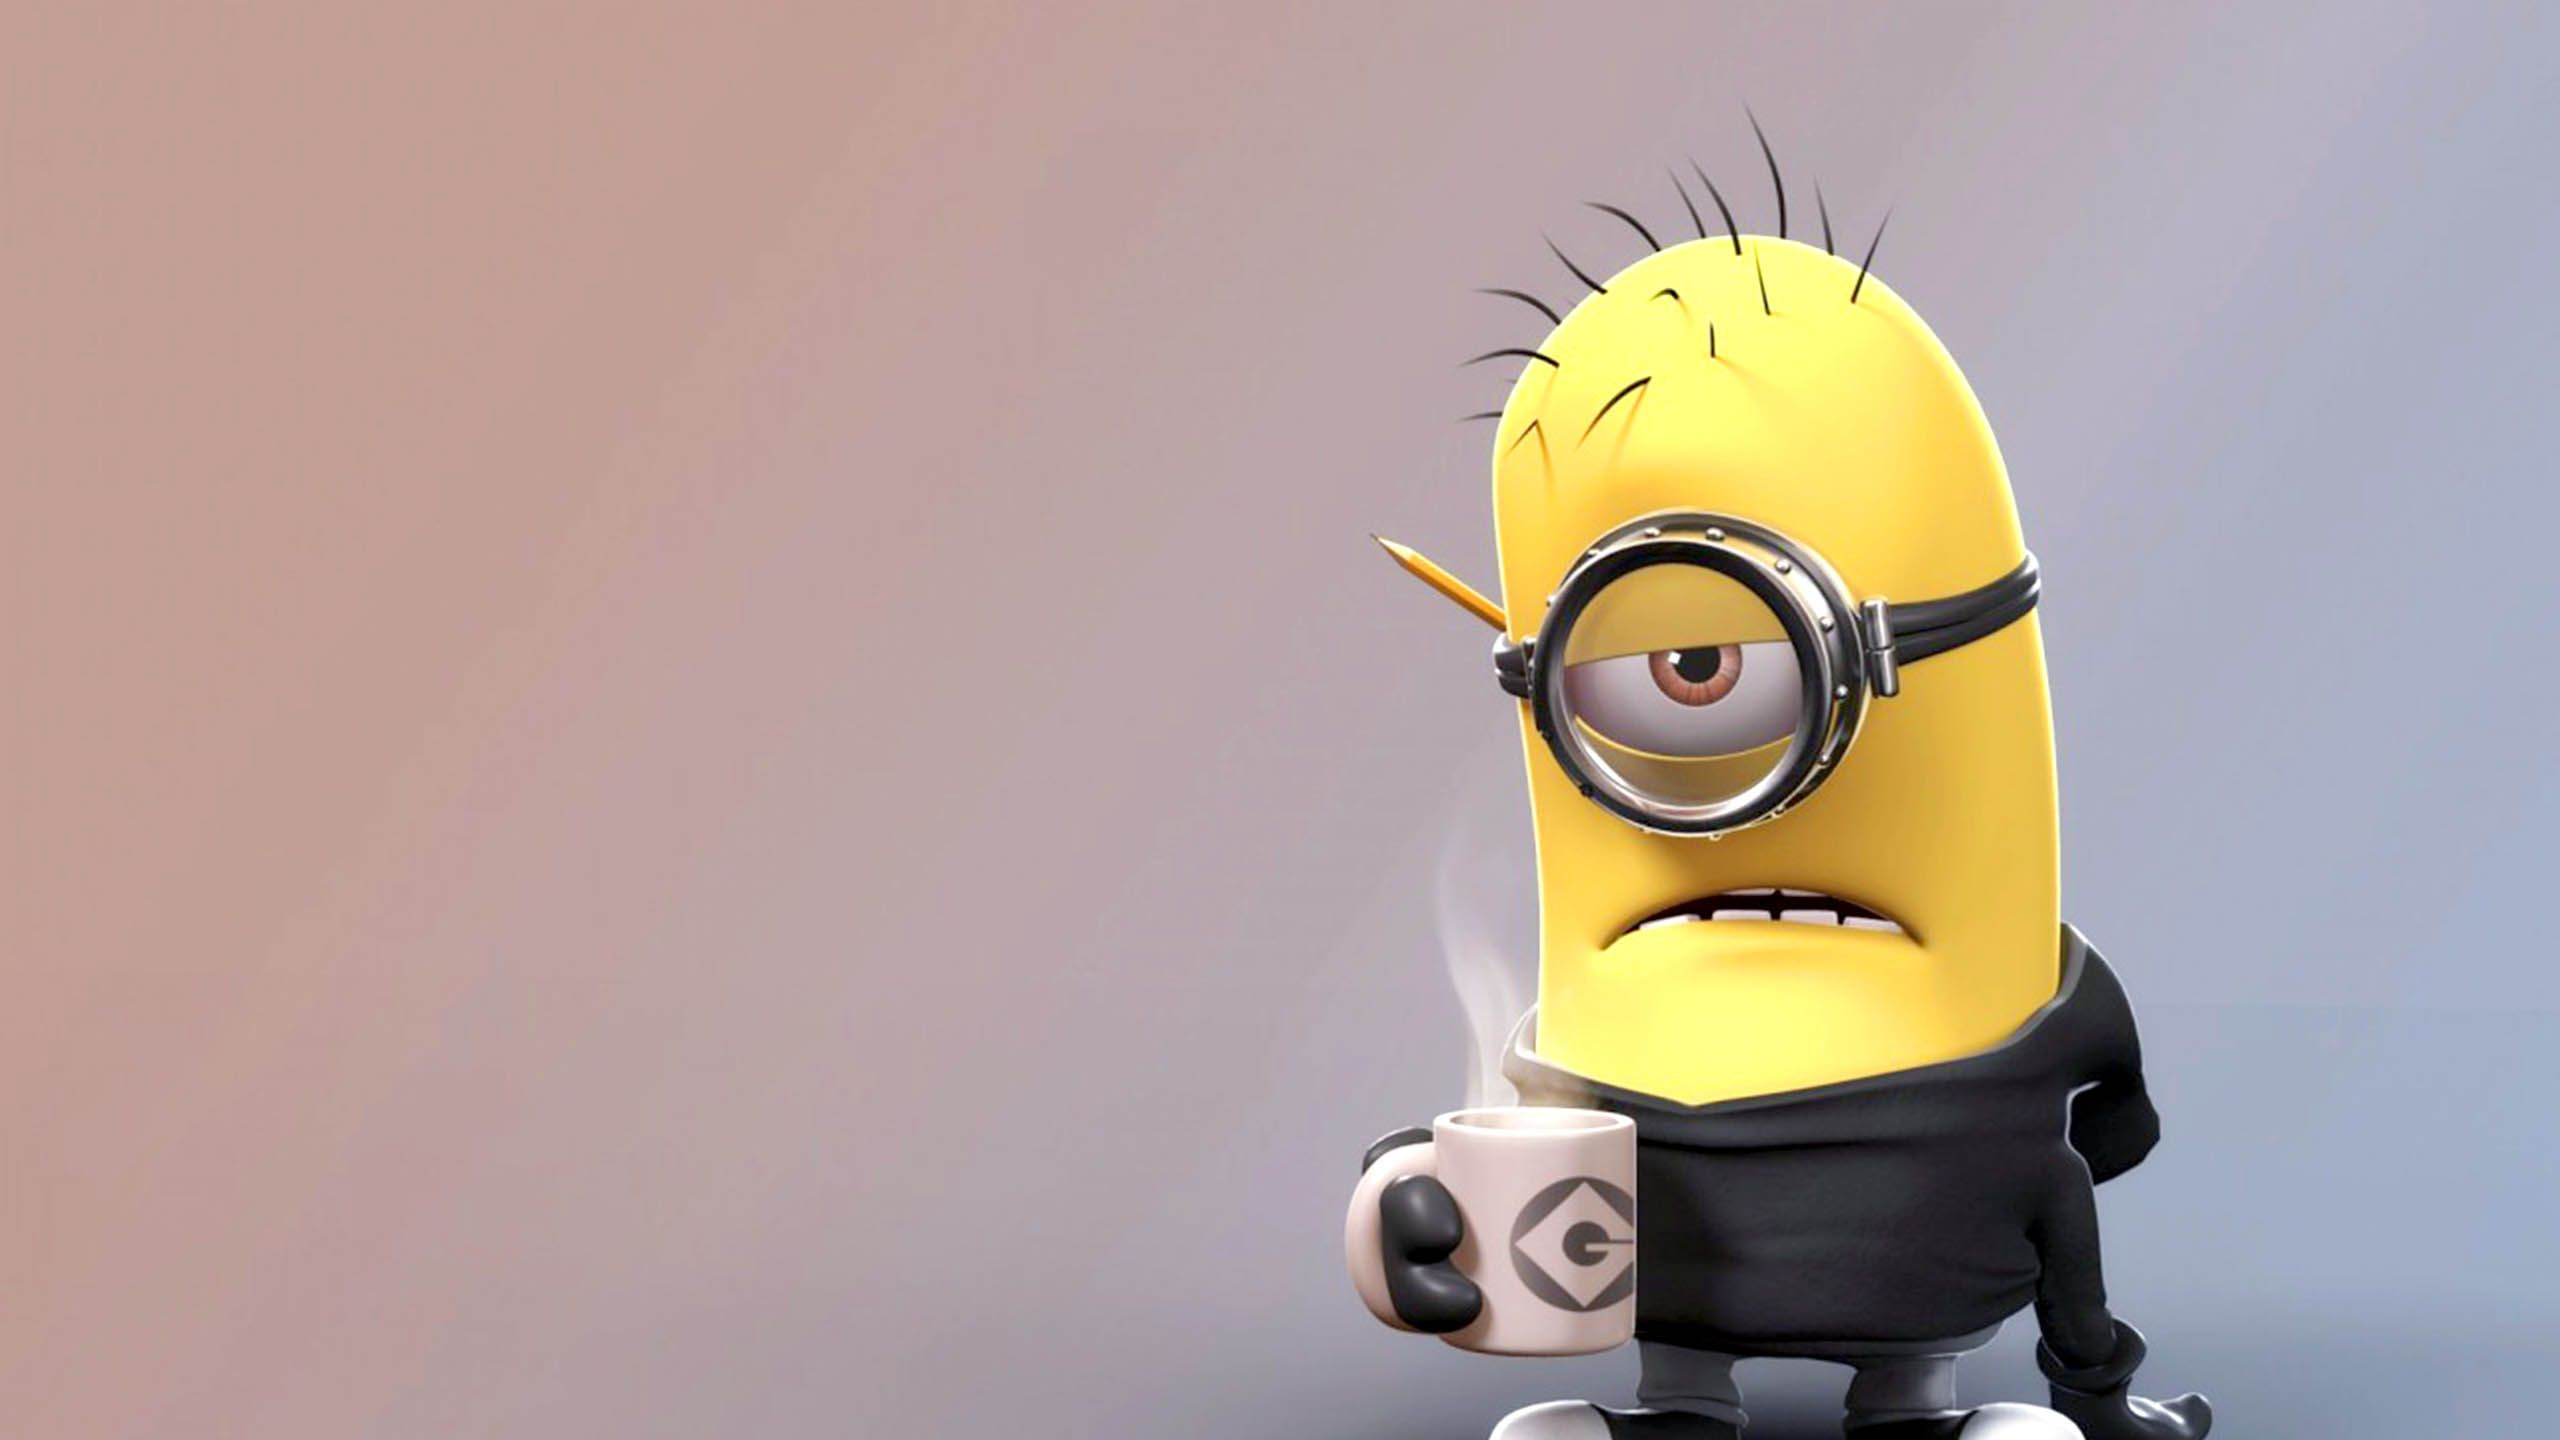 Wallpaper iphone banana - Banana Minion Wallpaper Despicable Me Movie Http